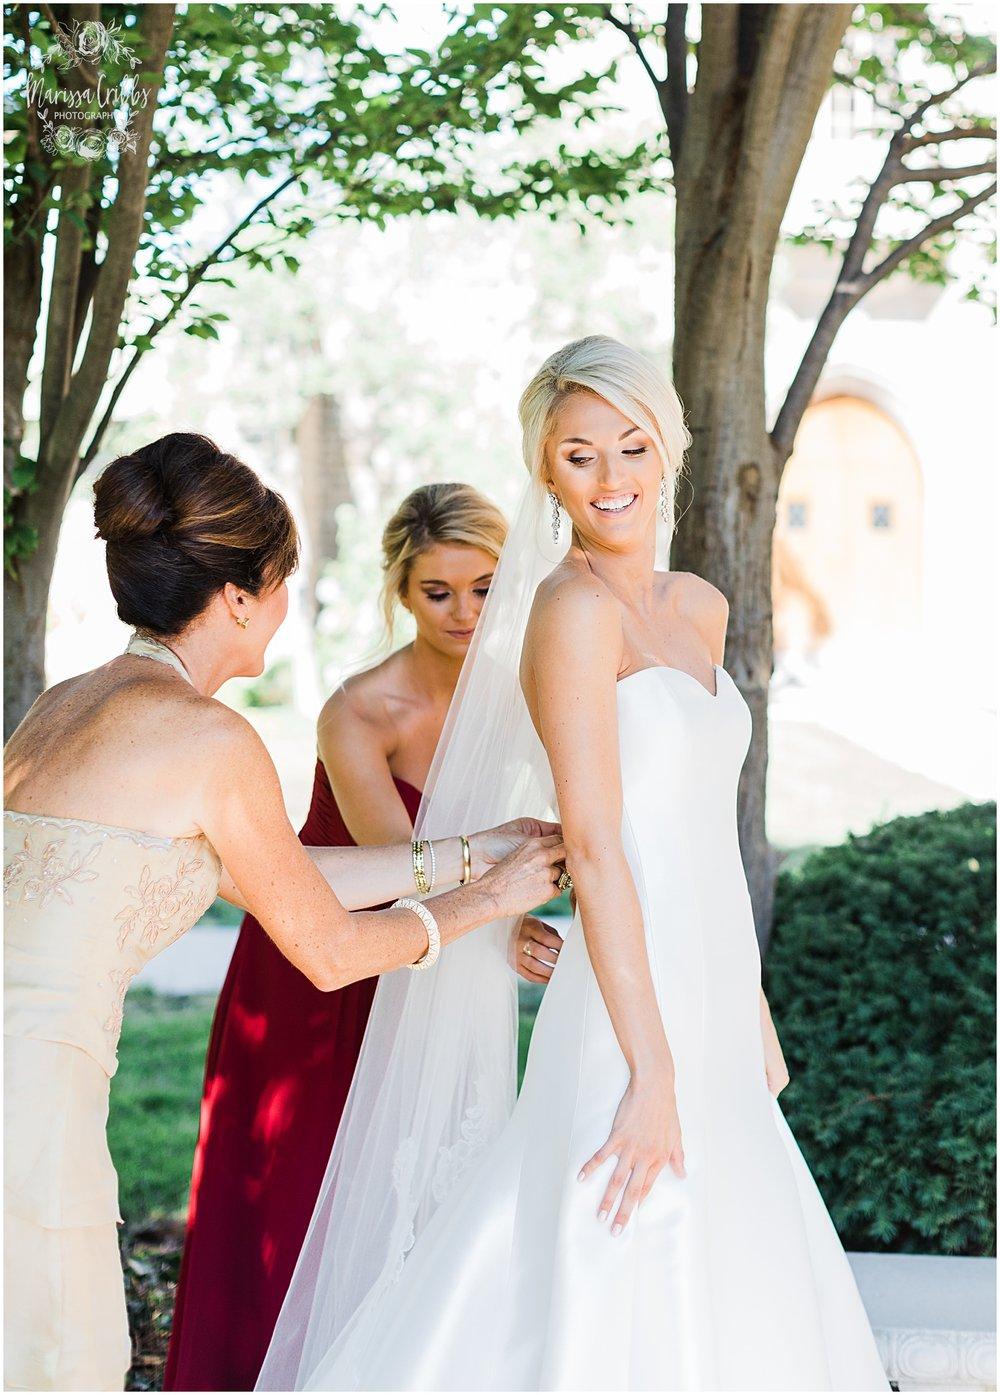 NOLL WEDDING | THE BRASS ON BALTIMORE | MARISSA CRIBBS PHOTOGRAPHY_6271.jpg